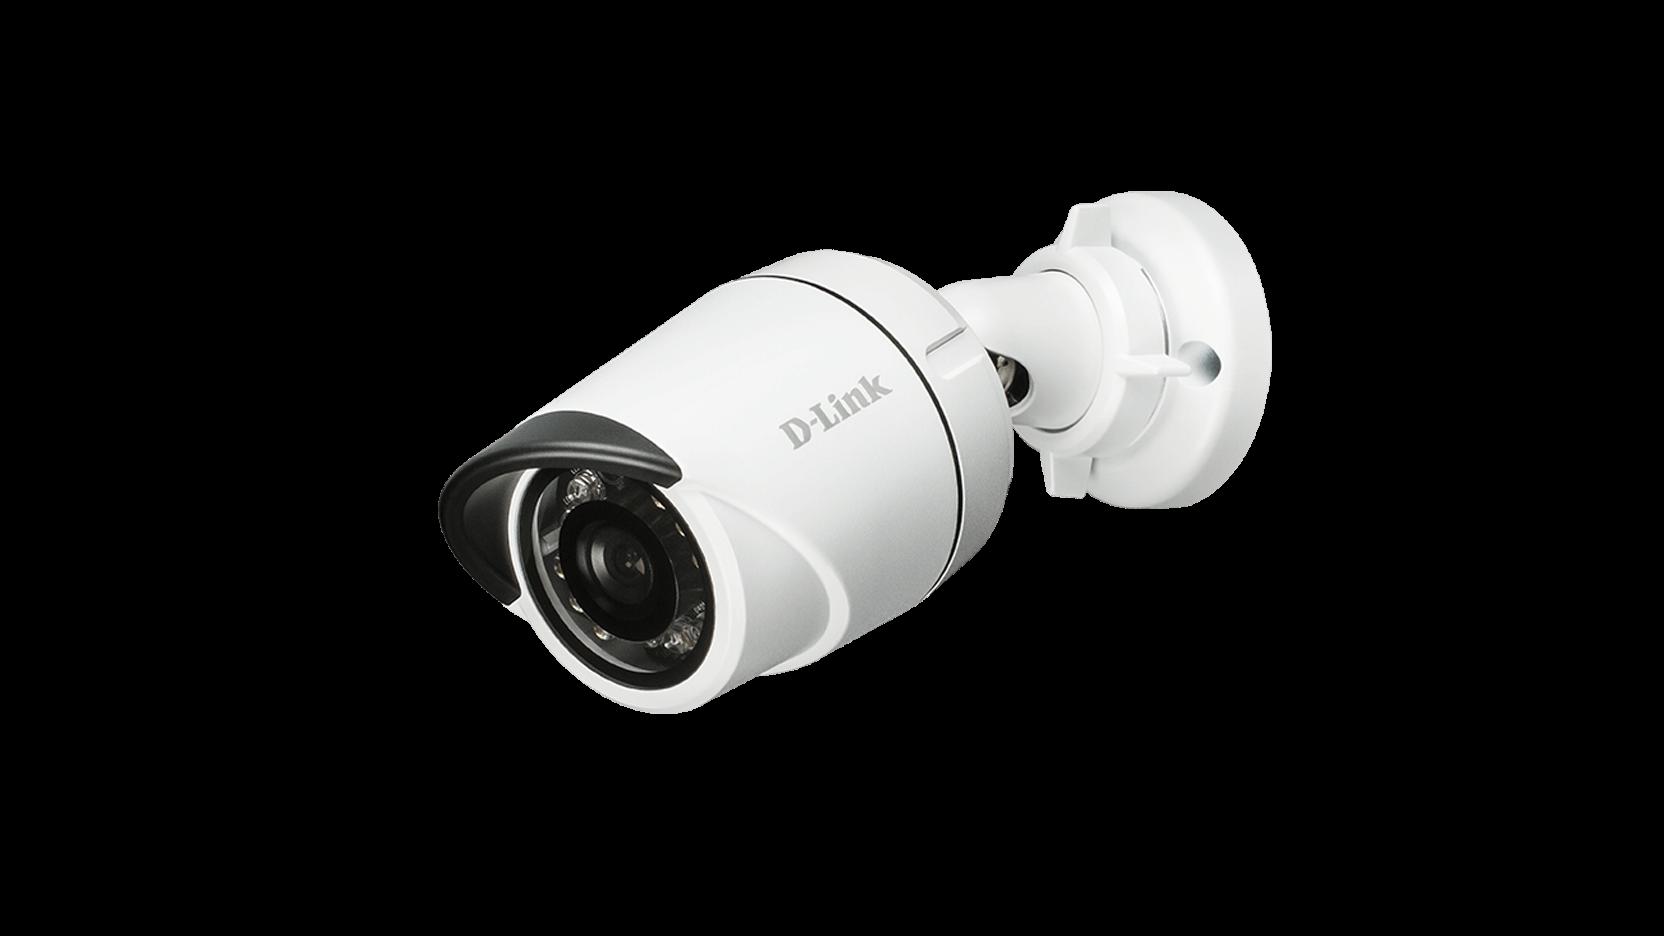 D-Link DCS-4703E WDR kamera 3Mpix, POE